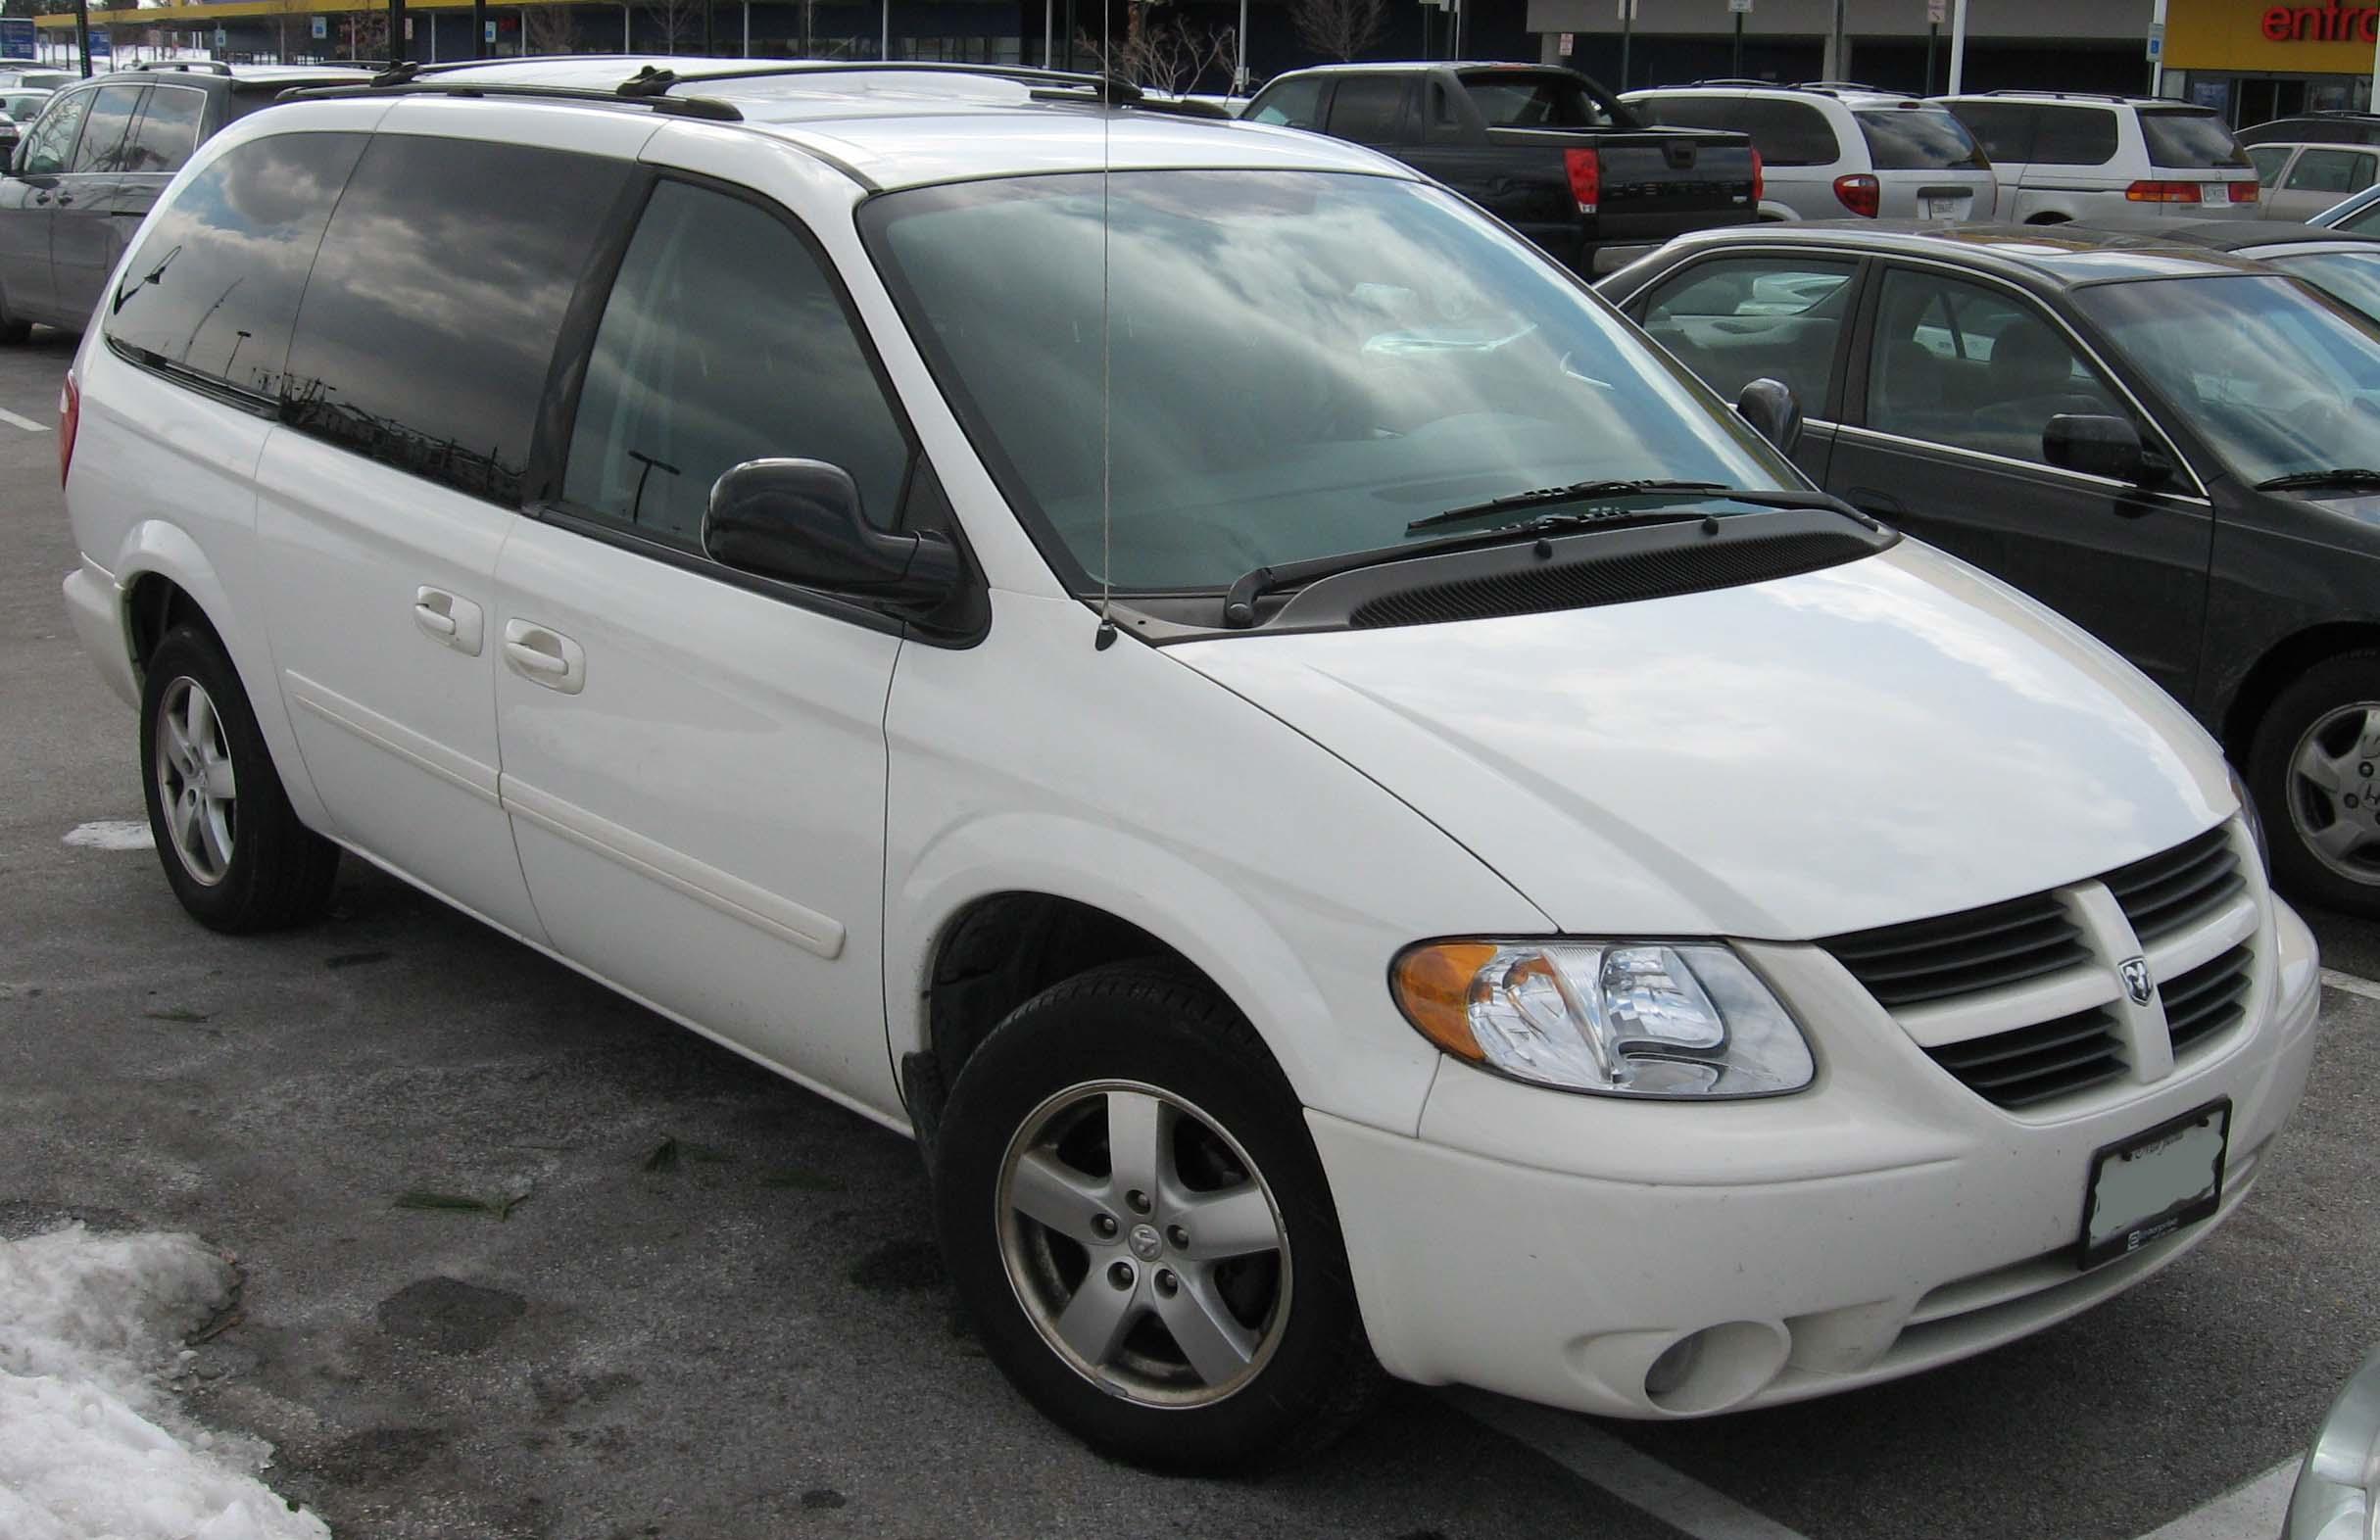 Dodge Work Van >> File:2005-2007 Dodge Grand Caravan.jpg - Wikimedia Commons